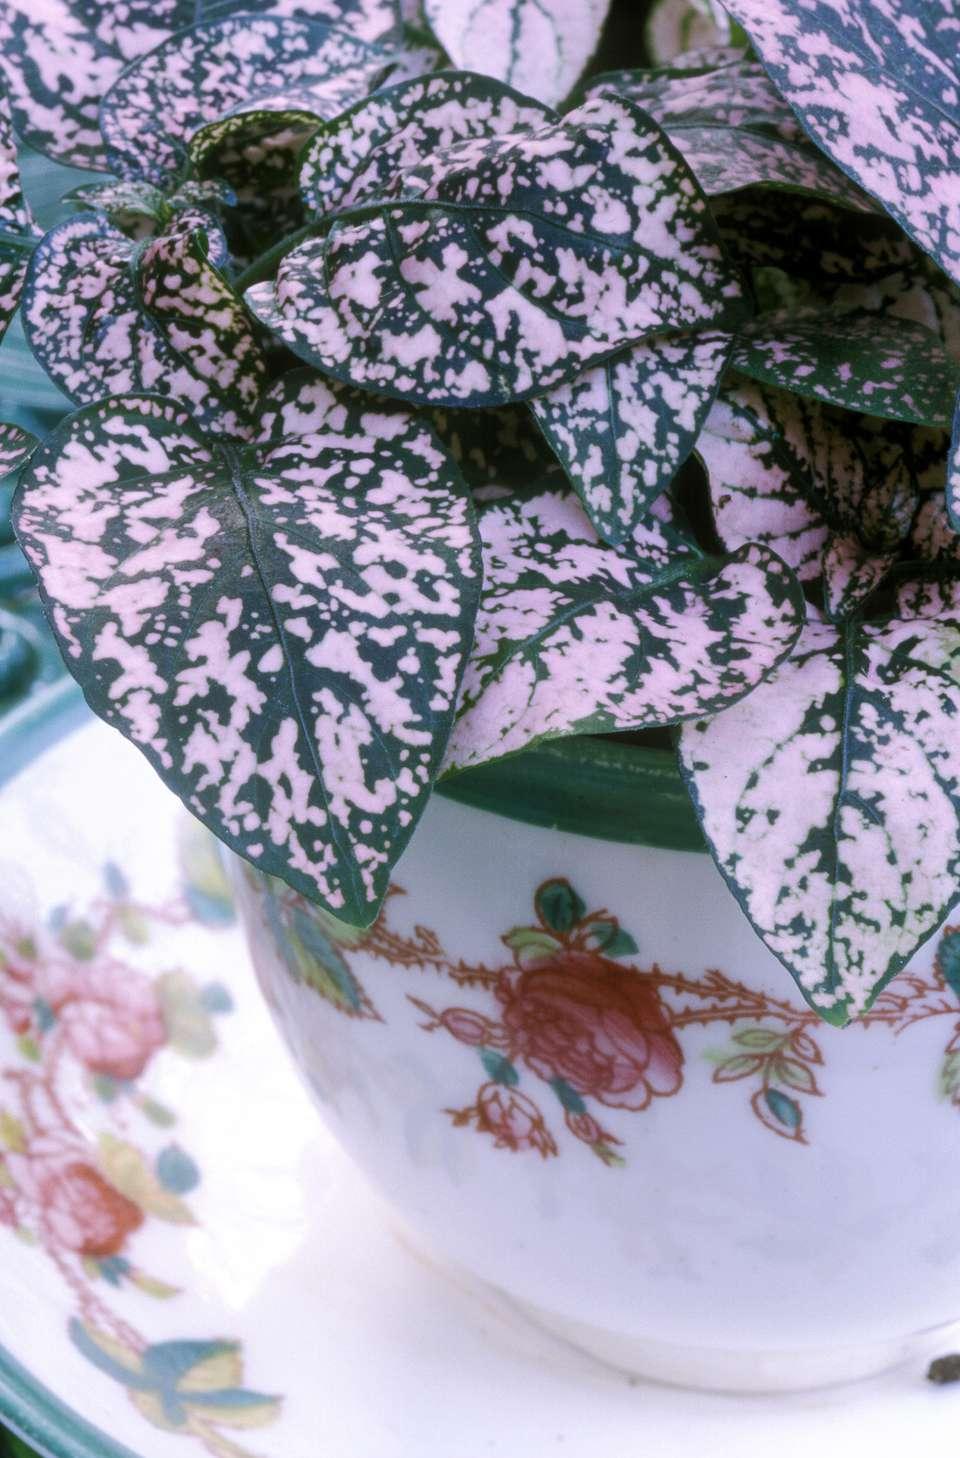 polka-dot-plant-houseplant.jpg